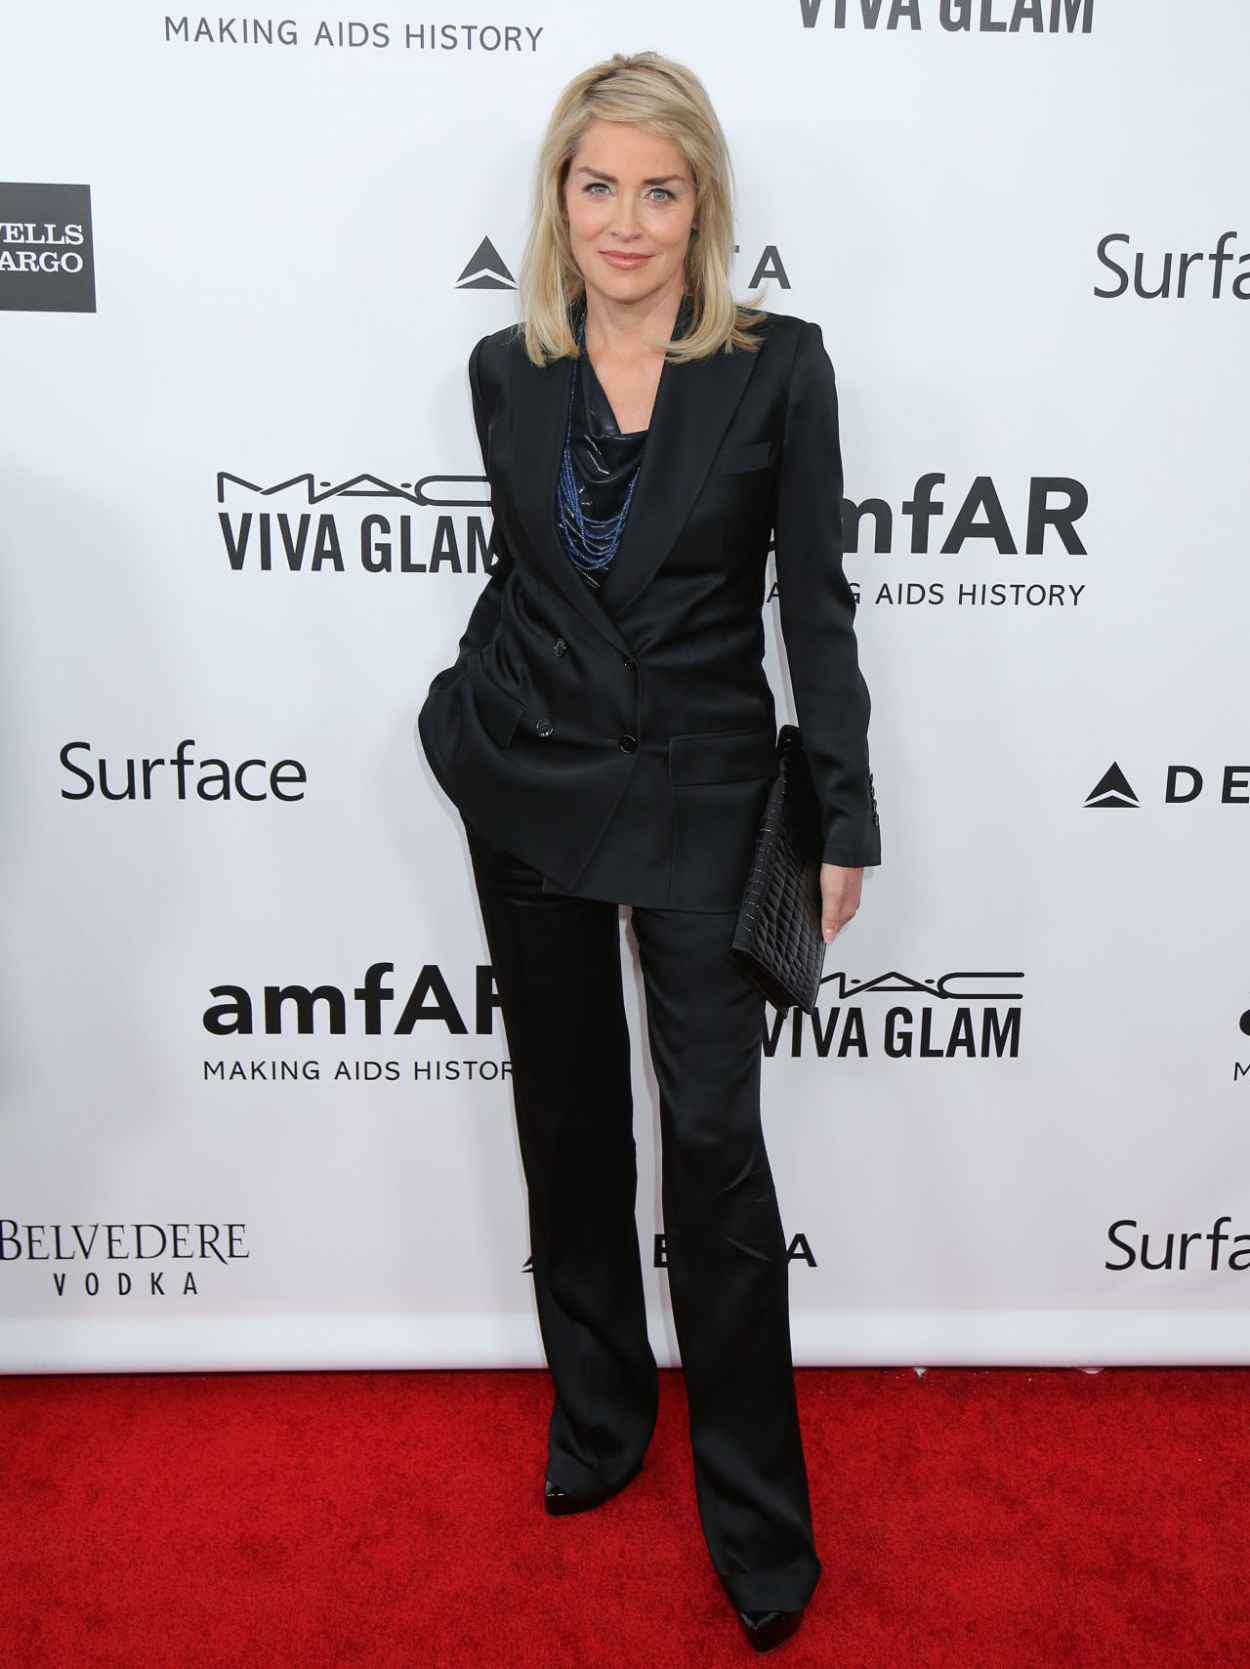 Sharon Stone at 2015 amFAR Inspiration Gala Los Angeles in LA - December 2015-1